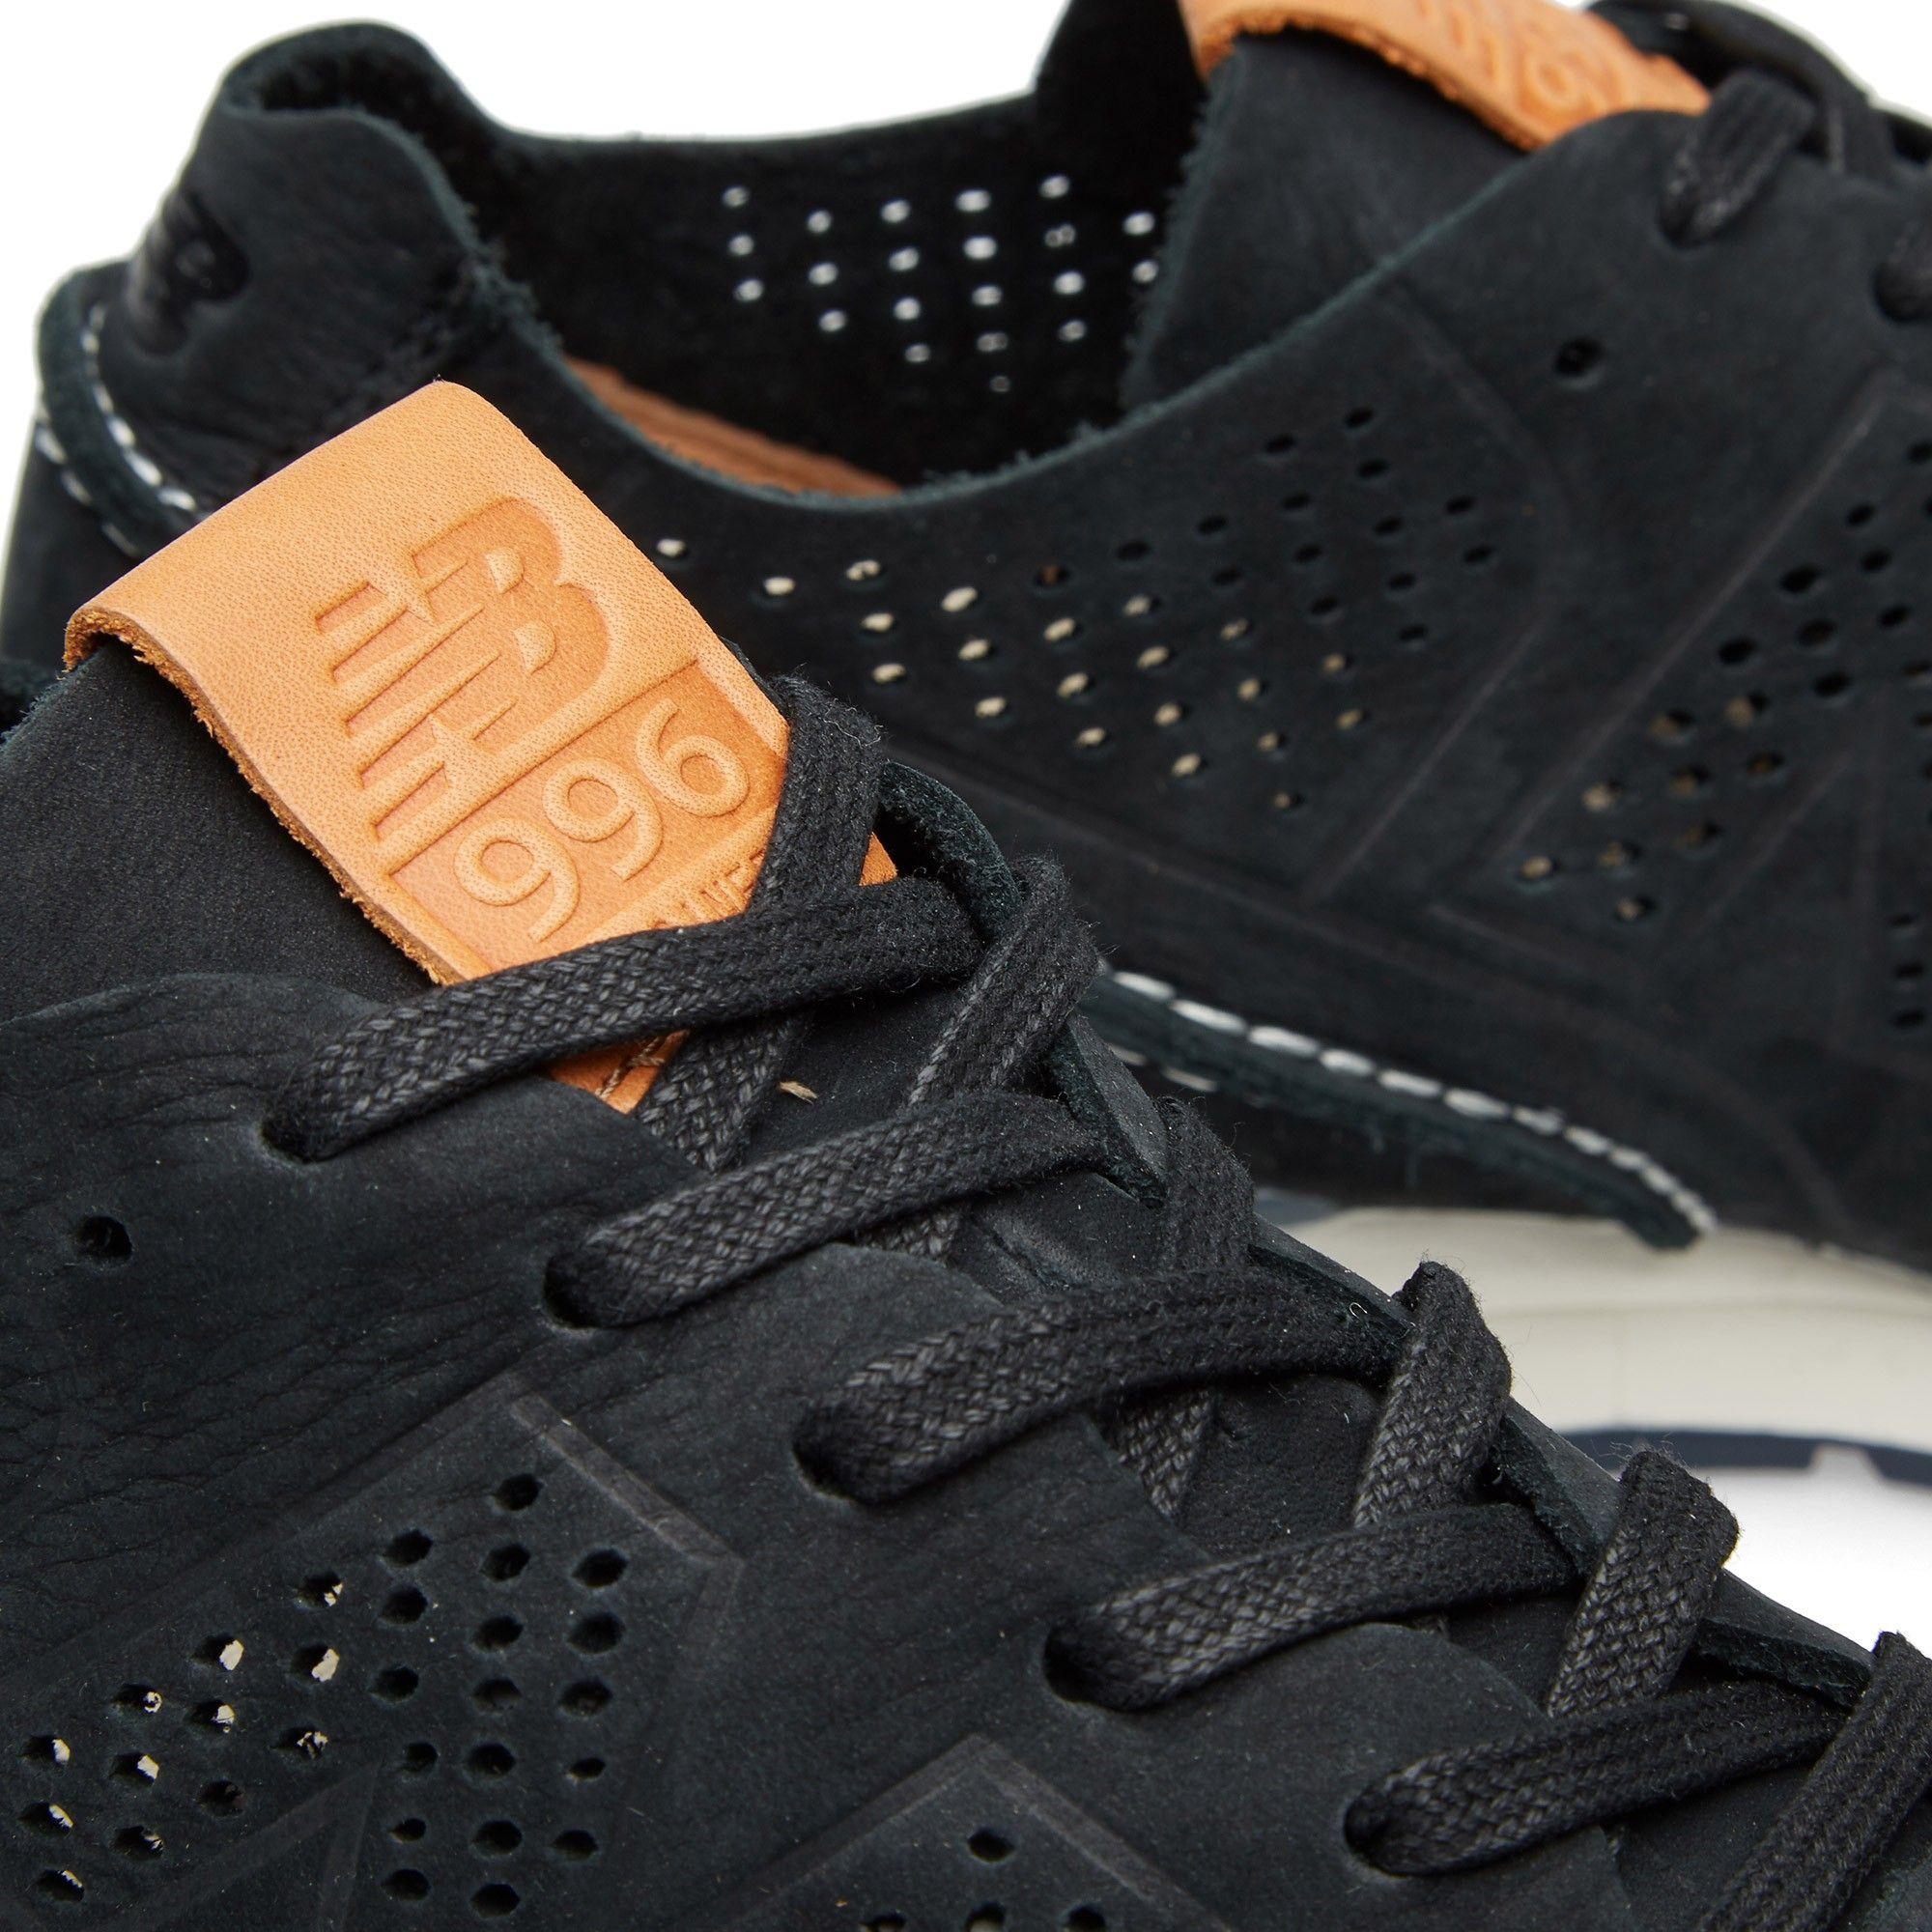 new balance 996 re engineered black